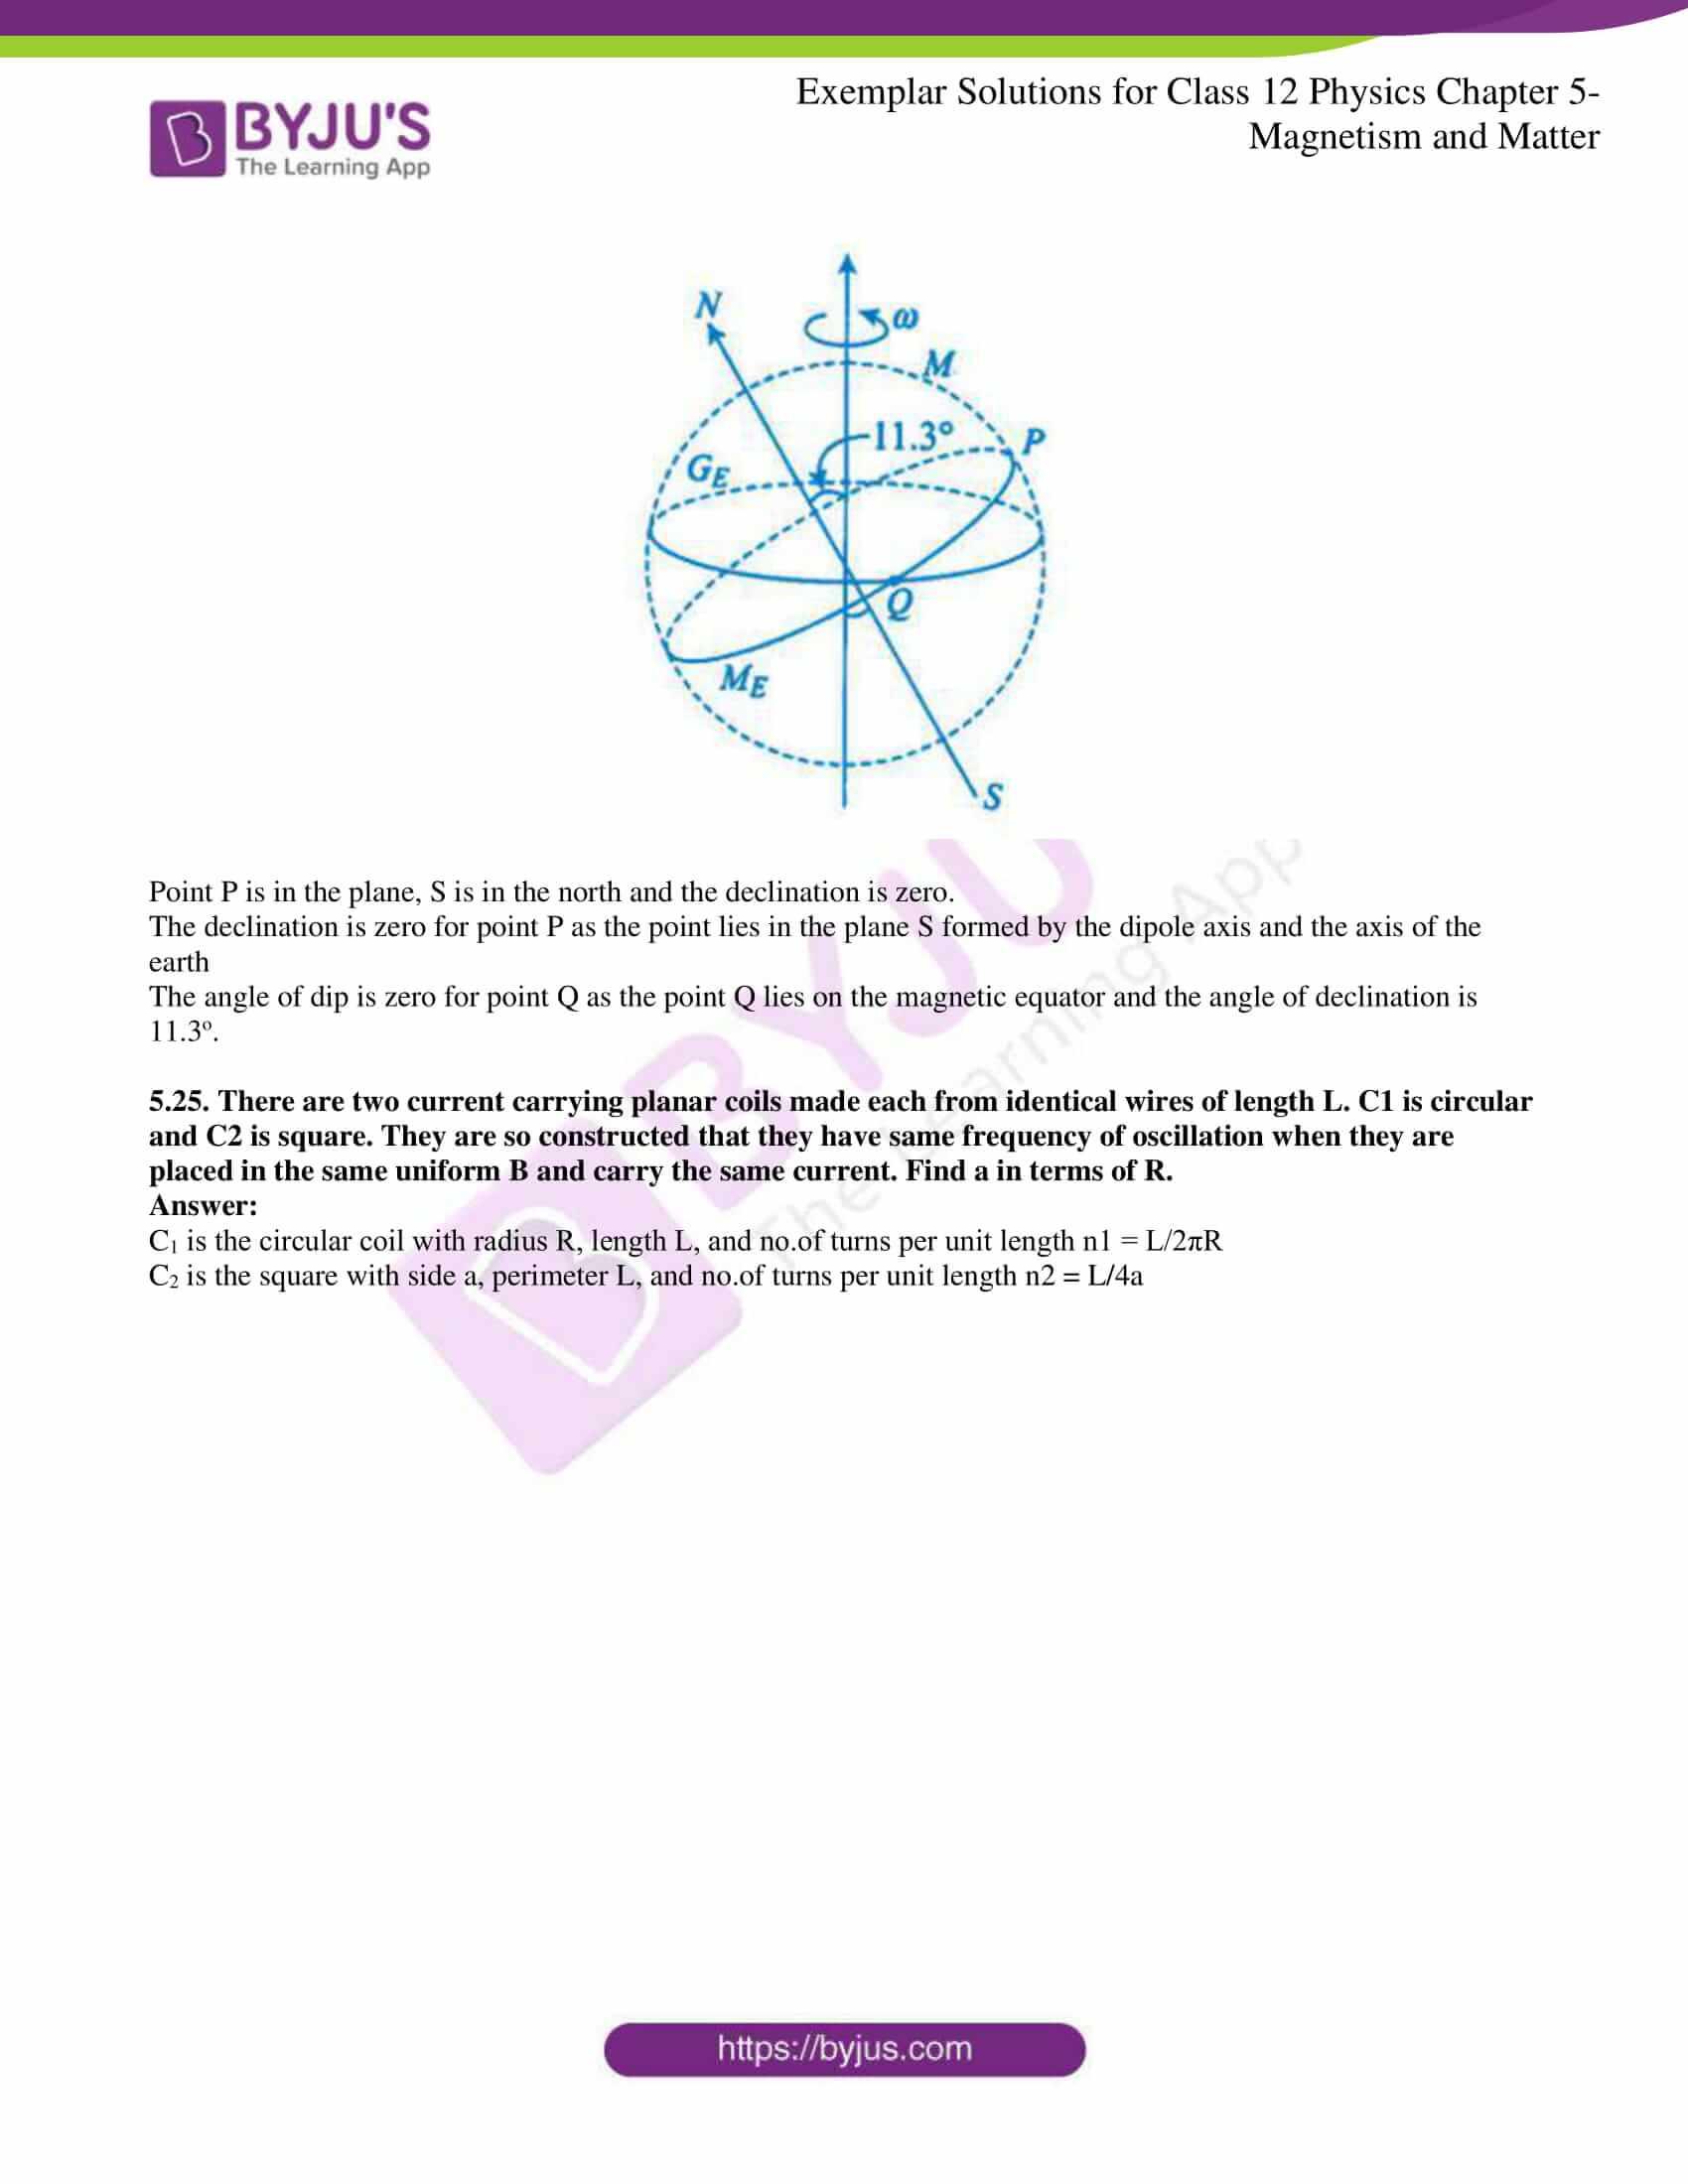 ncert exemplar solutions for class 12 physics chapter 5 10